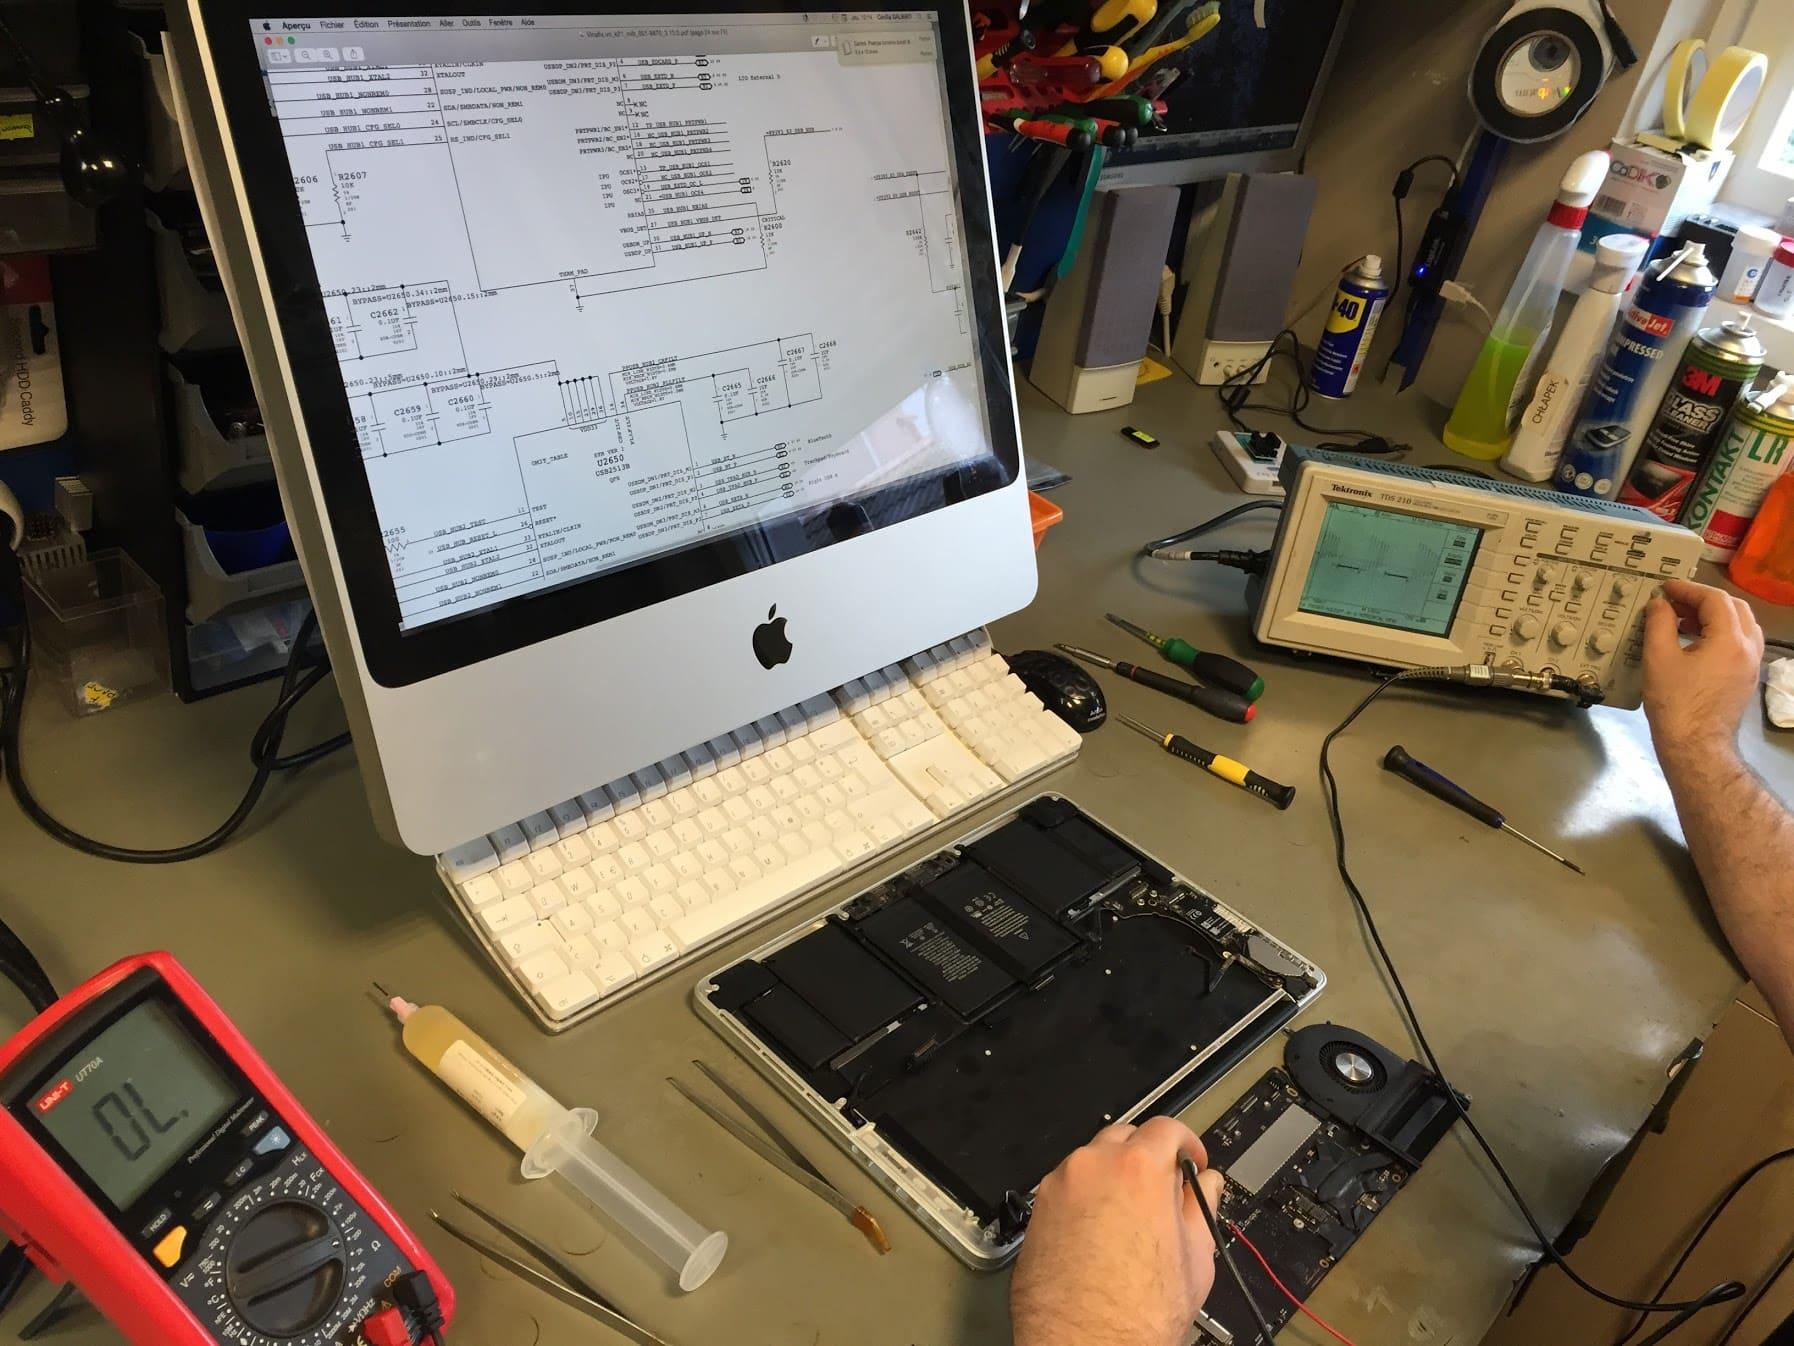 Naprawa komputera wrocław